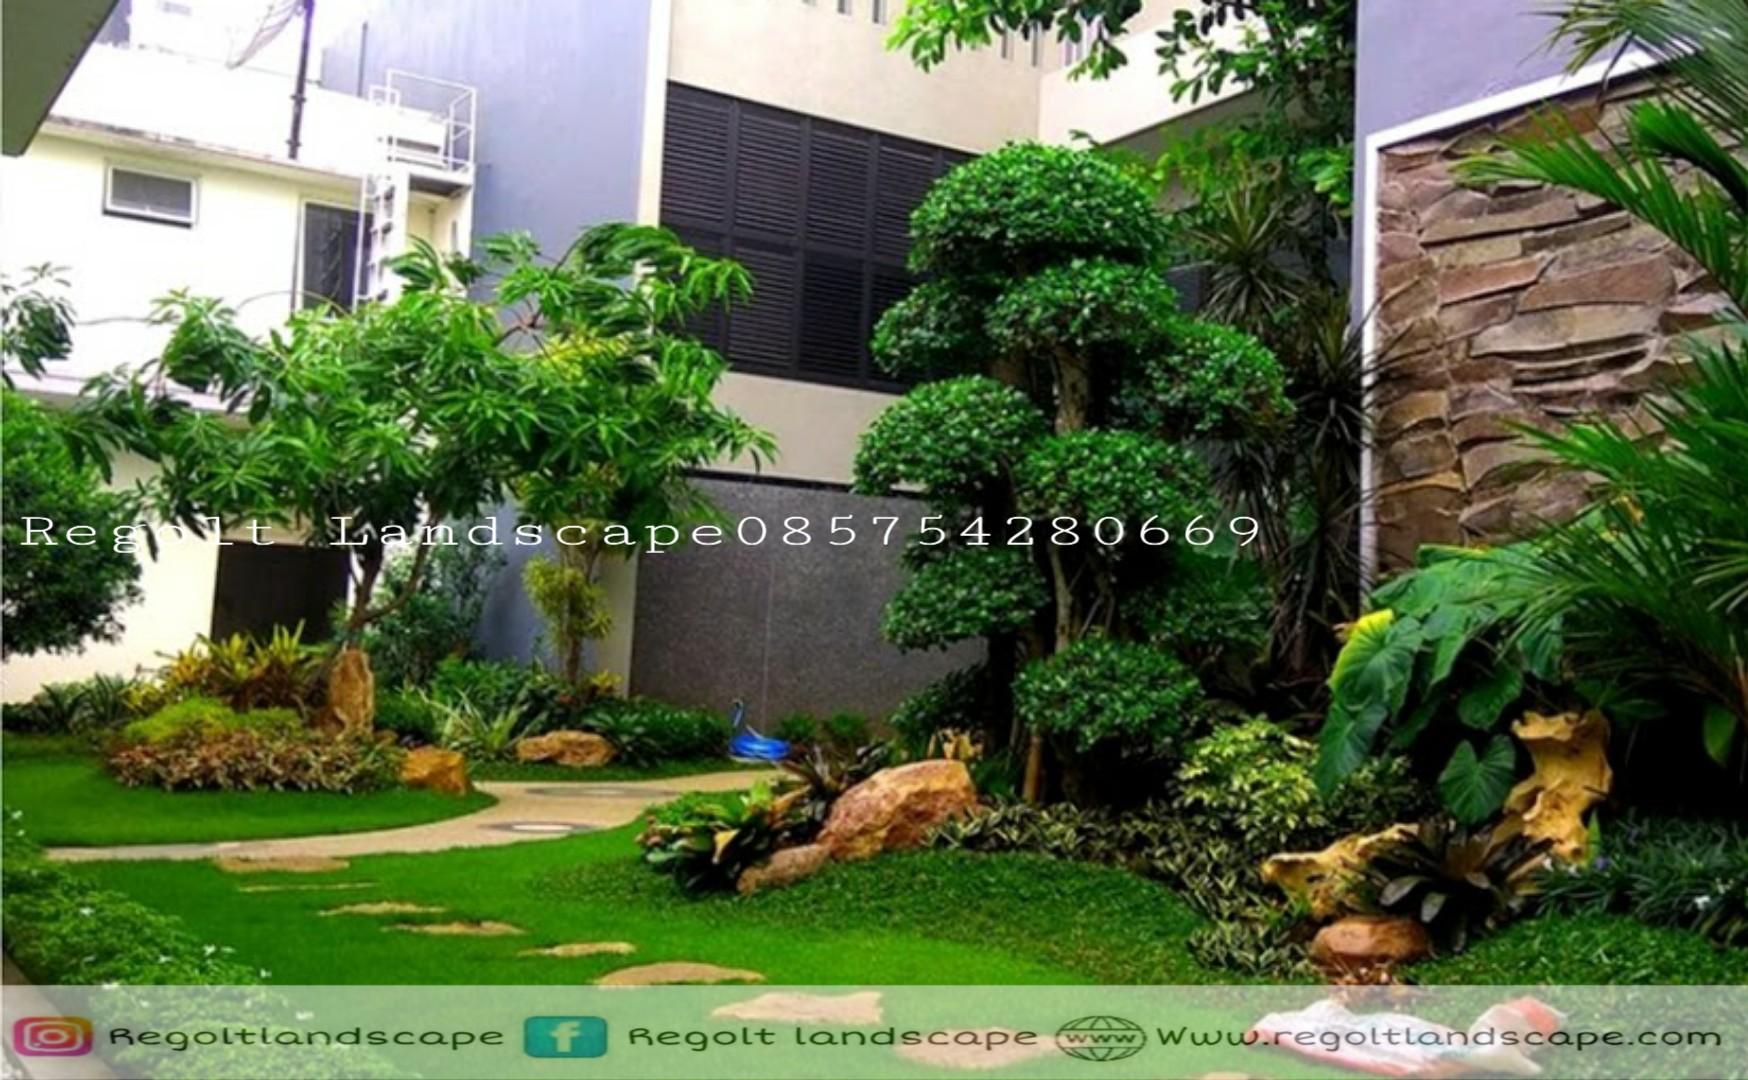 Jasa Tukang Taman Murah Di Kudus, Pati, Rembang